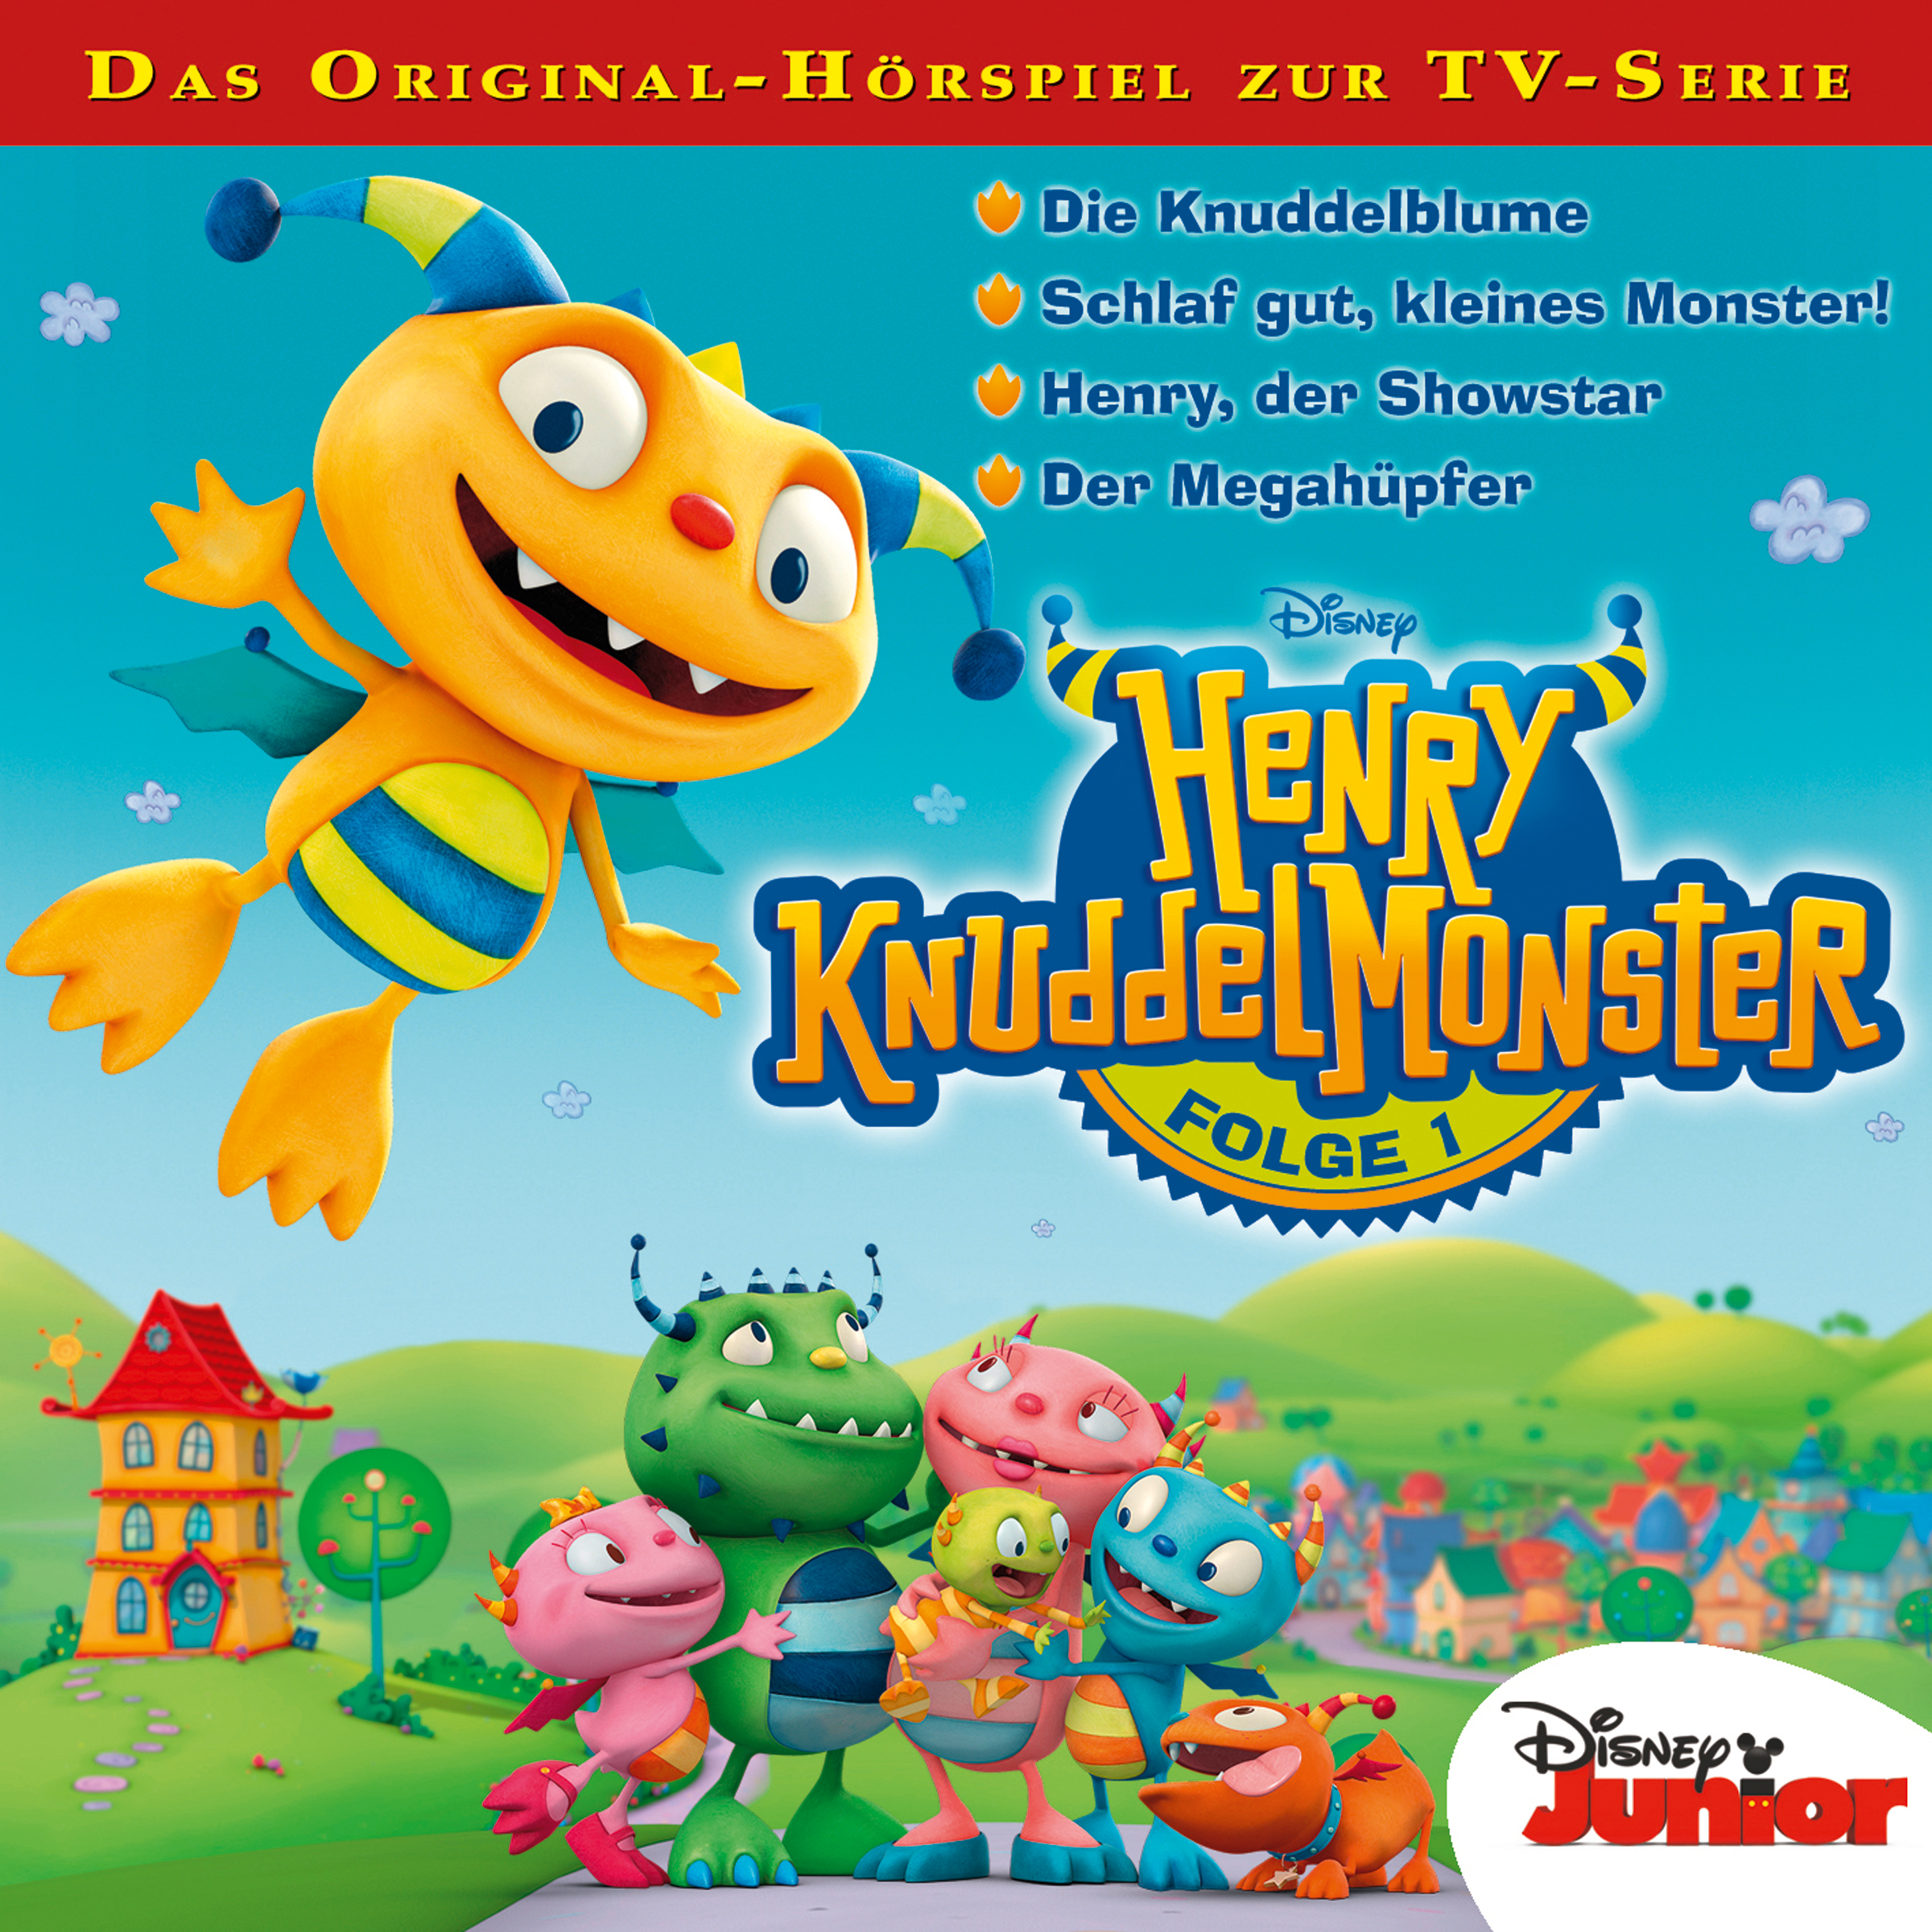 Disney: Henry Knuddelmonster (Folge 1) MP3-Download